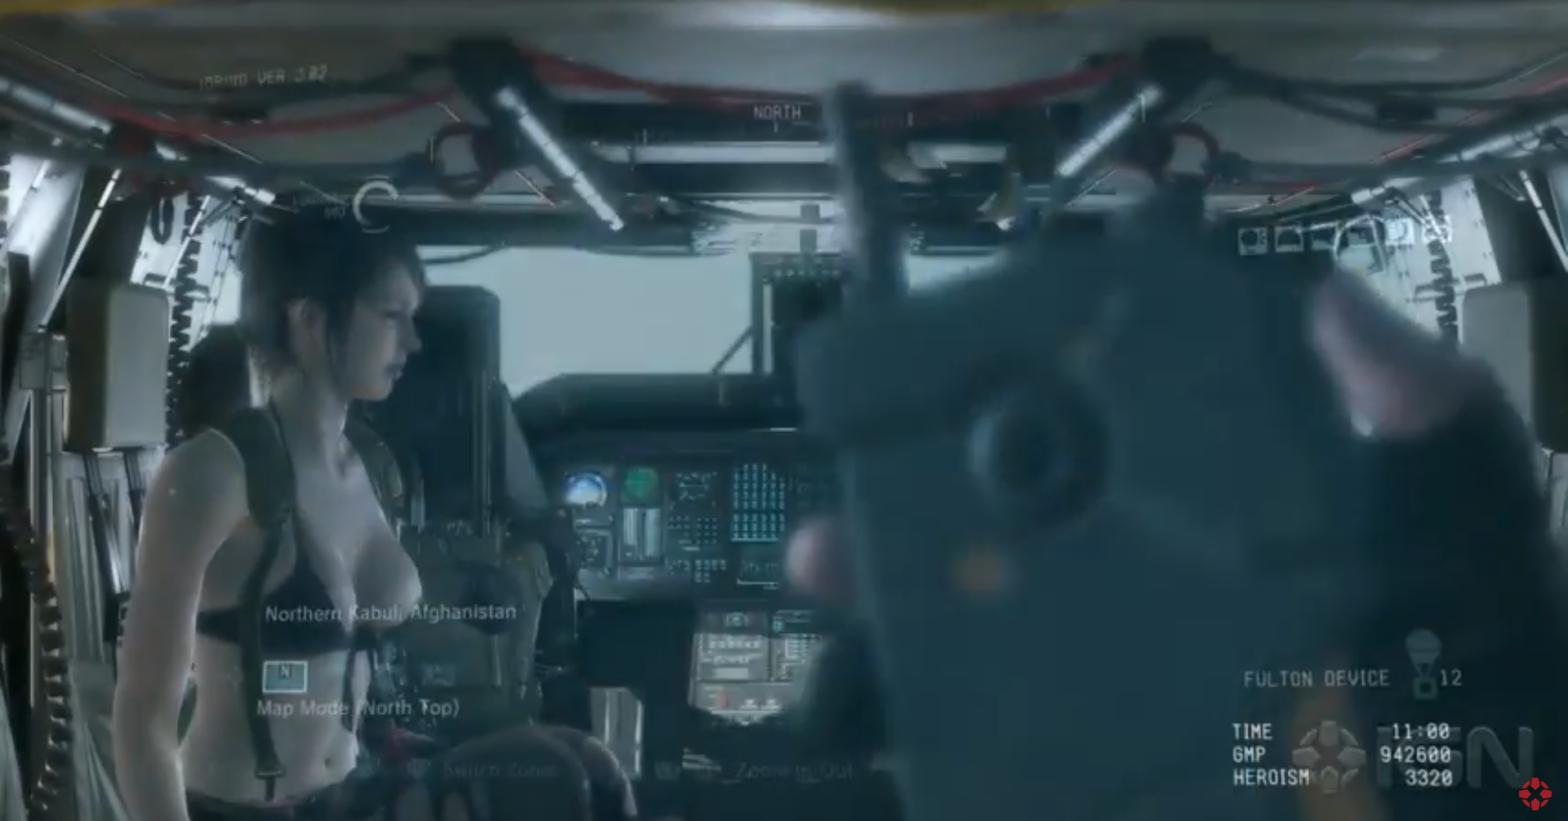 (Spoilerfrei) 40-minütige Gameplay-Demo zeigt Metal Gear Solid V: The Phantom Pain